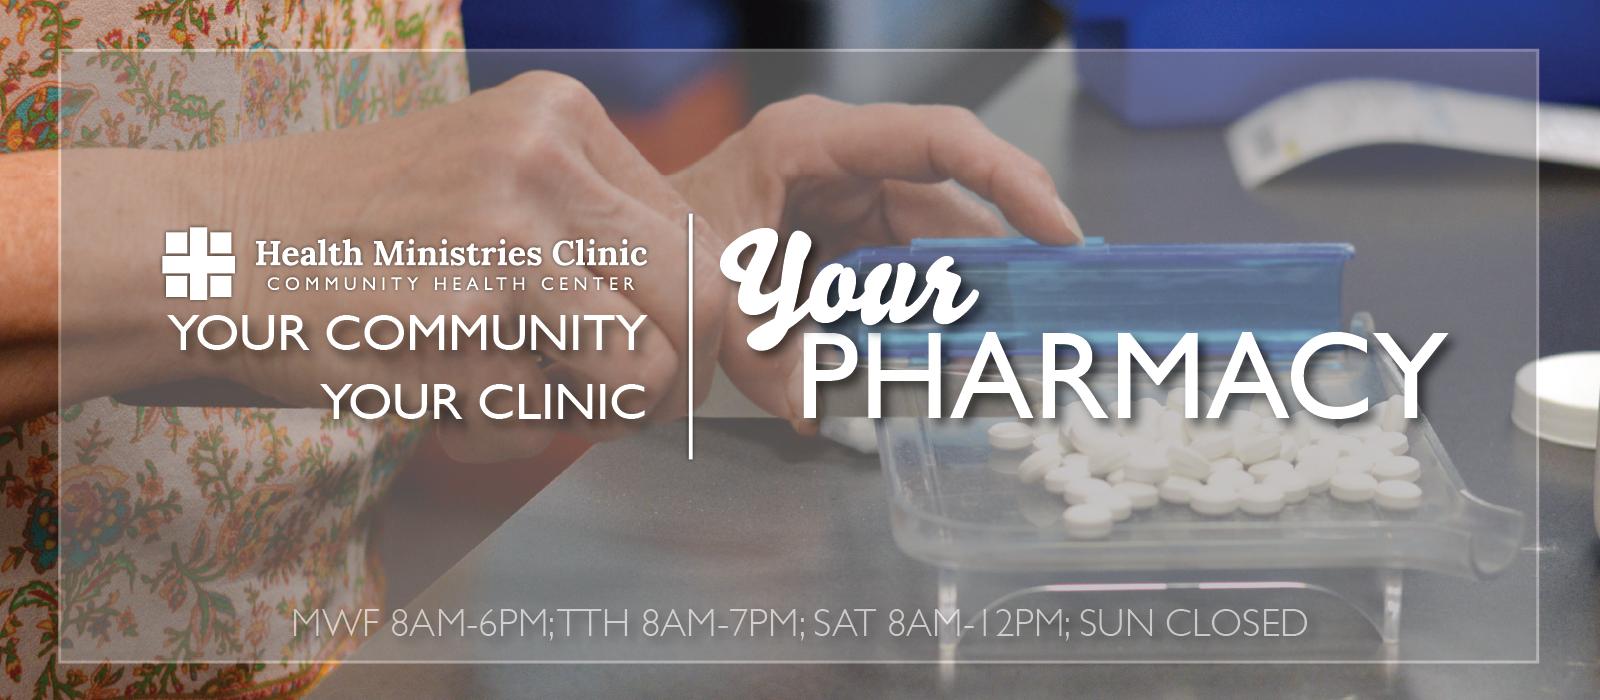 HMCKS pharmacy information